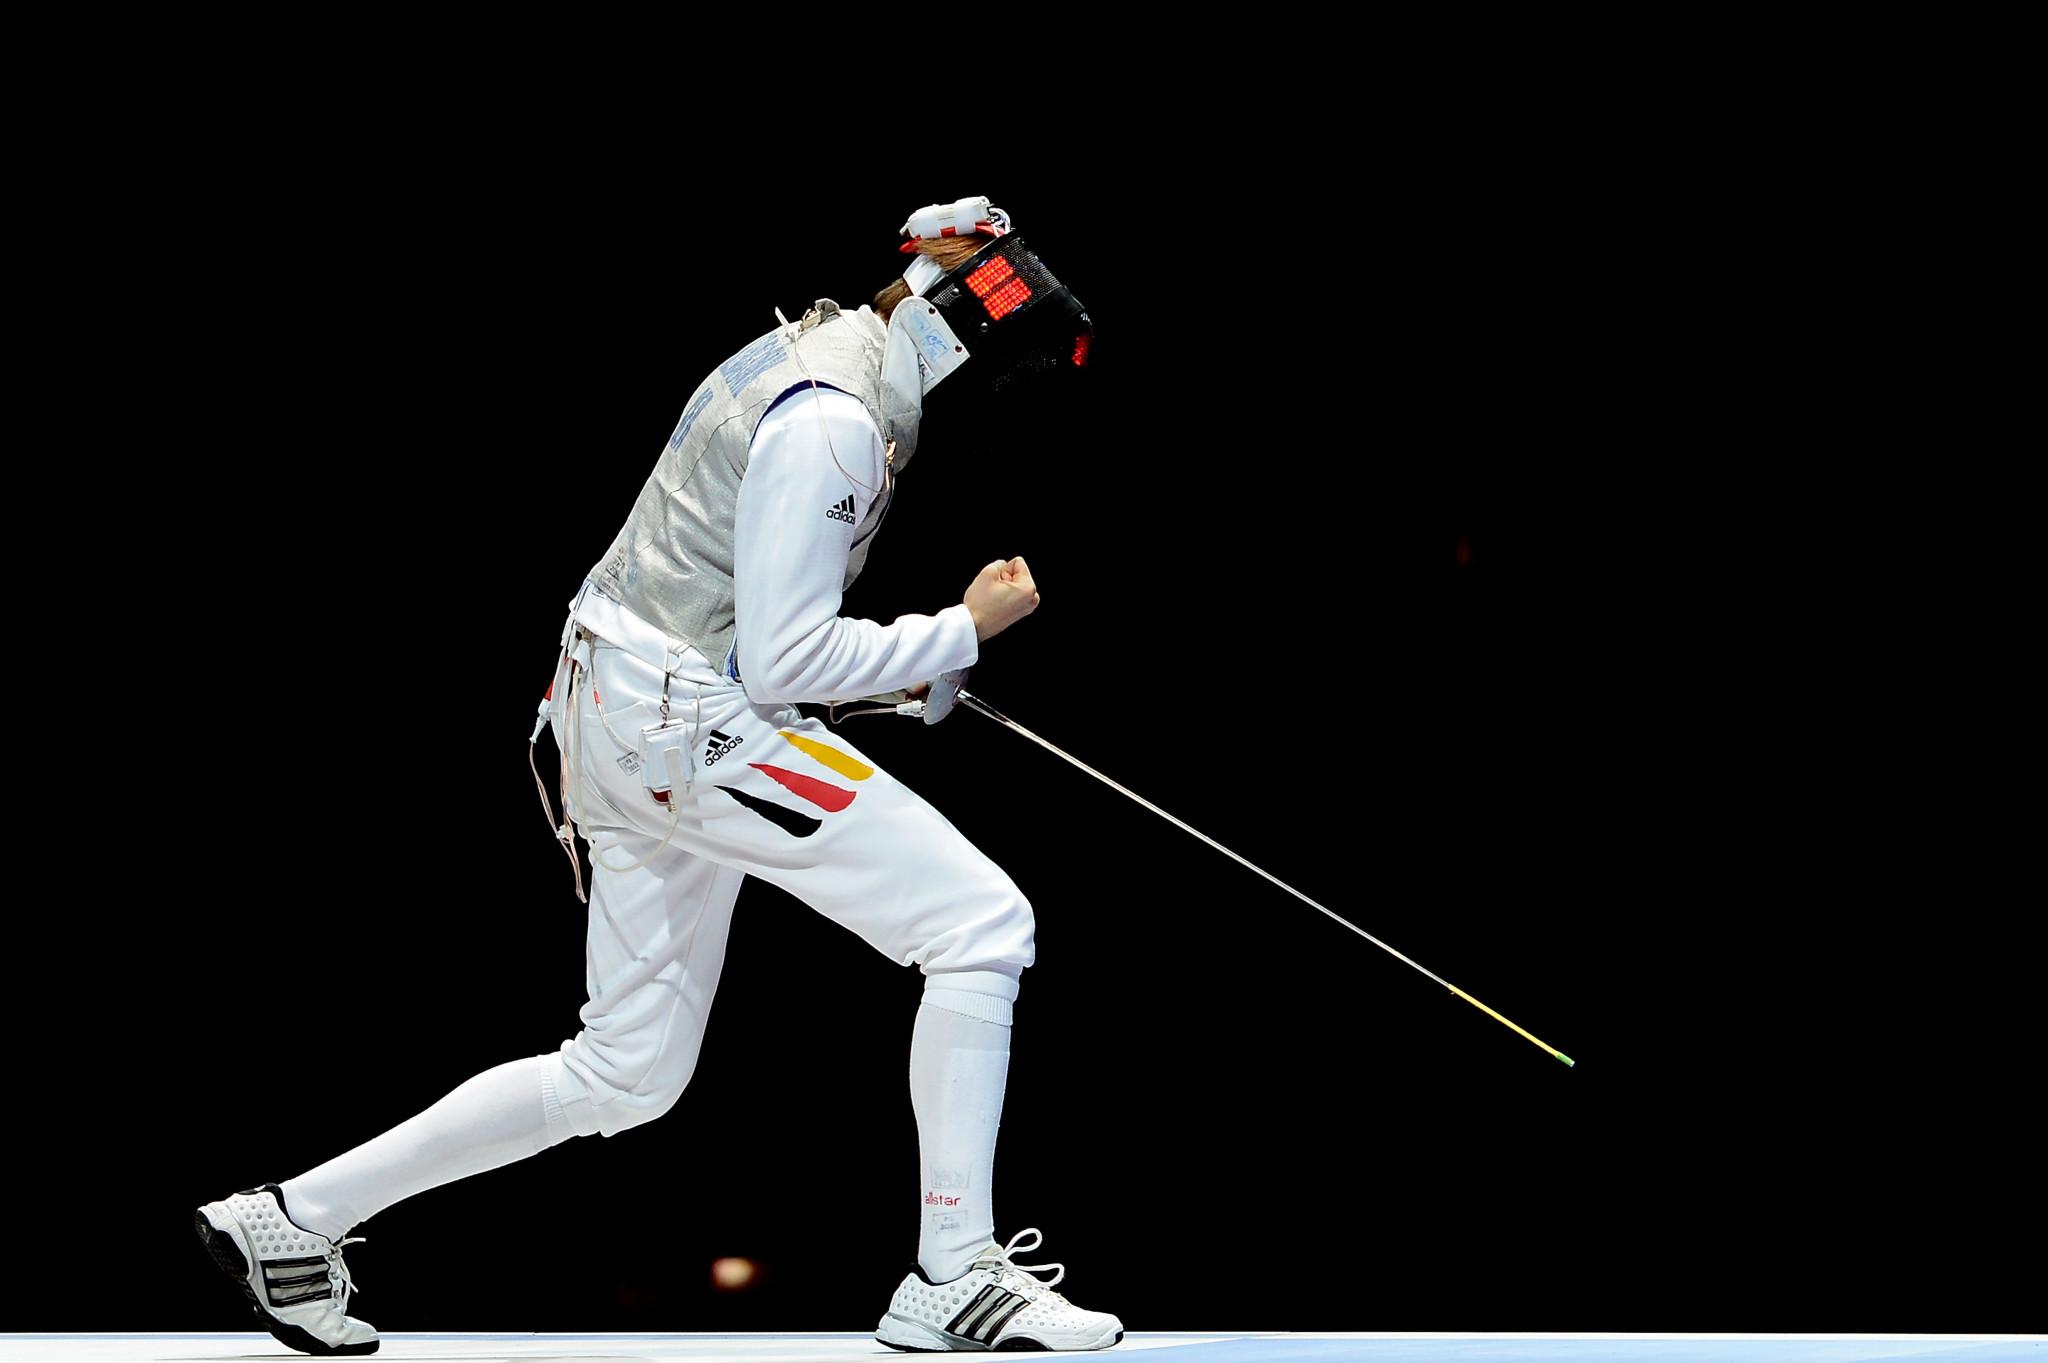 Beijing 2008 gold medallist Benjamin Kleibrink came through his group at the Challenge International de Paris ©Getty Images